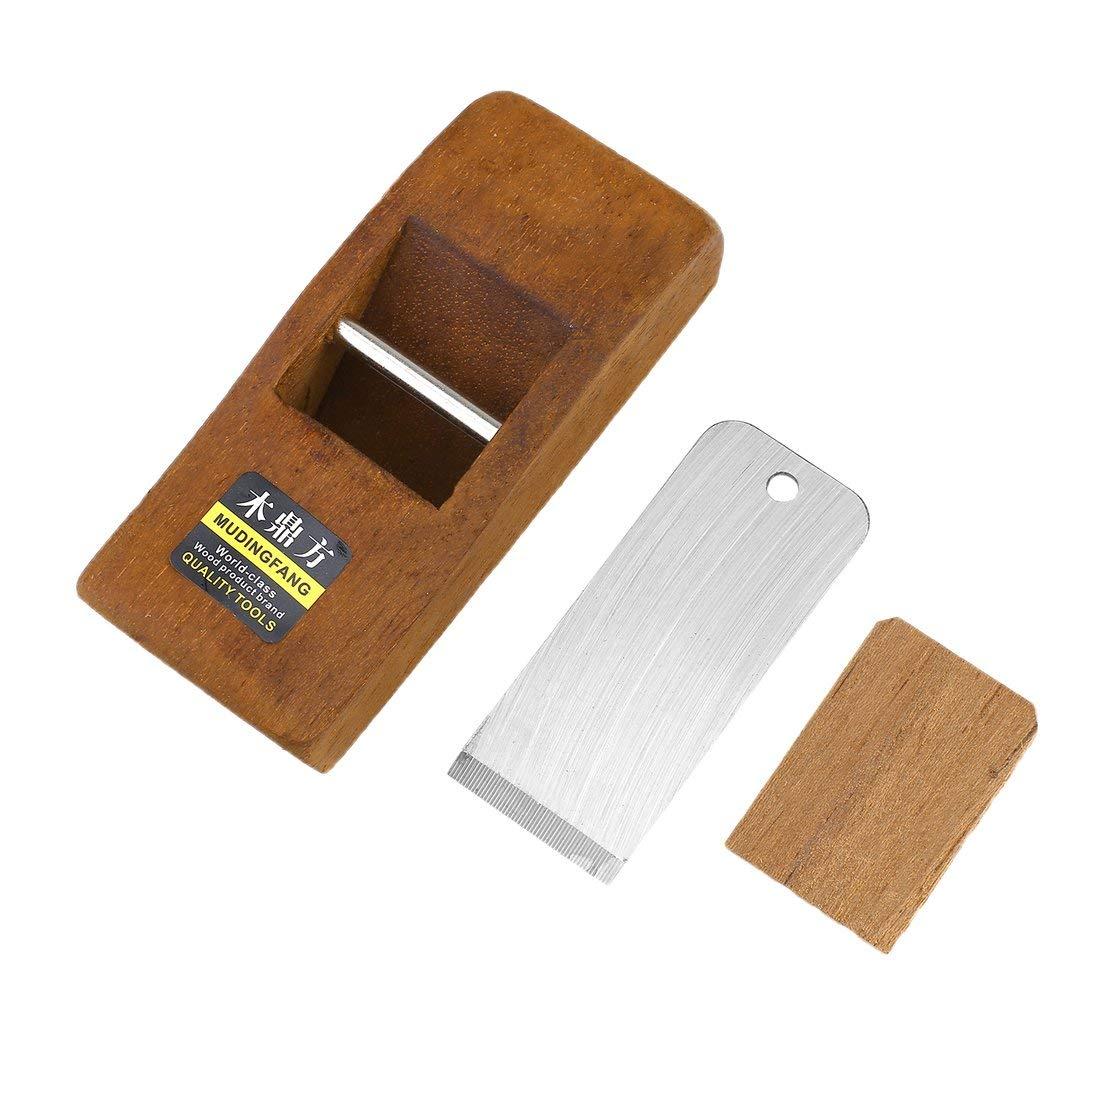 108 mm Mini carpinterí a plano plano mano cepillo bricolaje herramienta carpintero Woodcraft Togames-ES